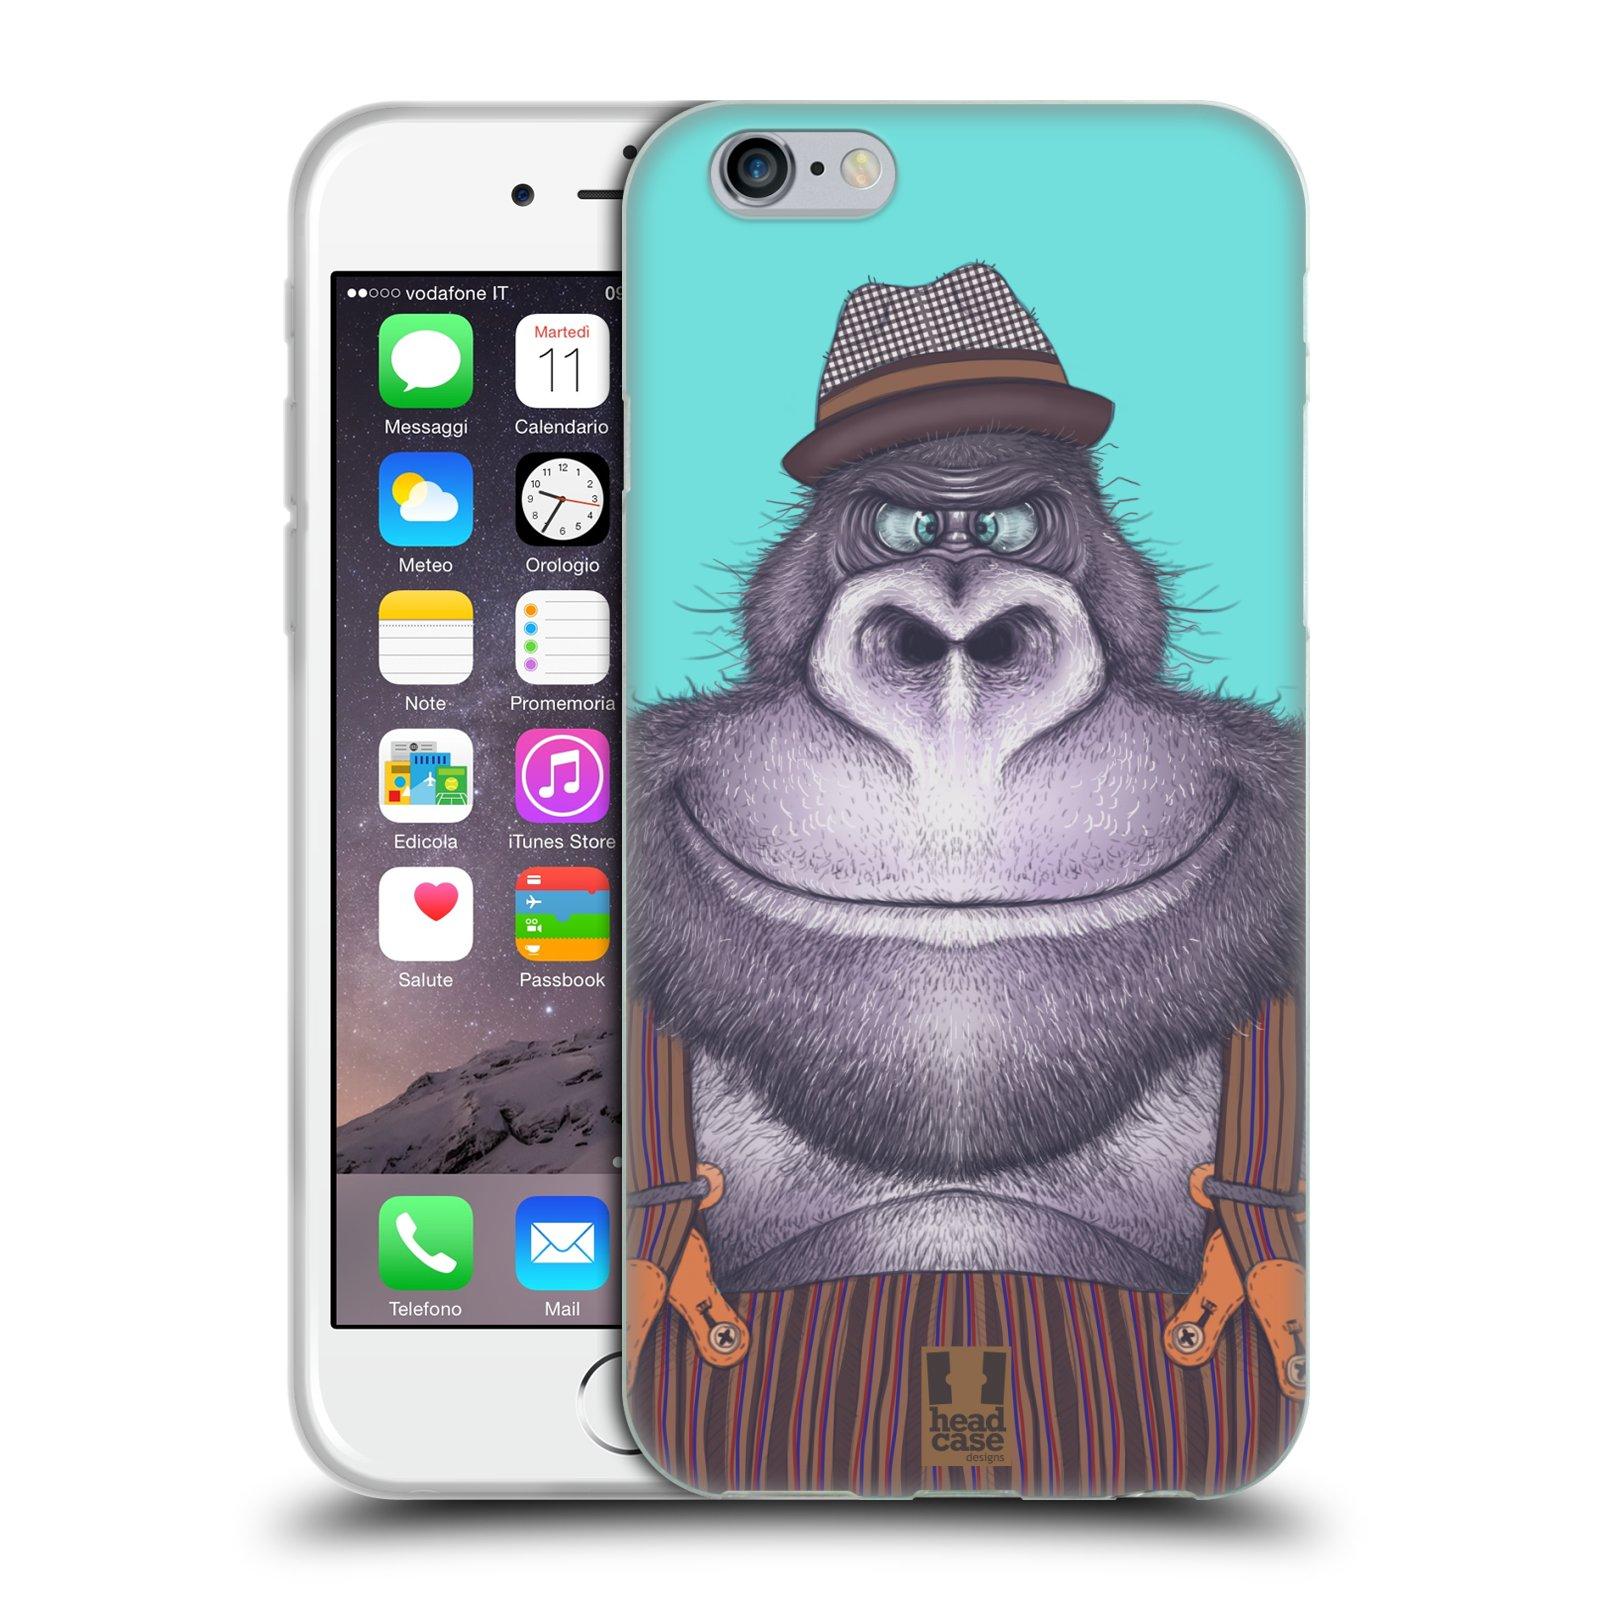 HEAD CASE silikonový obal na mobil Apple Iphone 6/6S vzor Kreslená zvířátka gorila